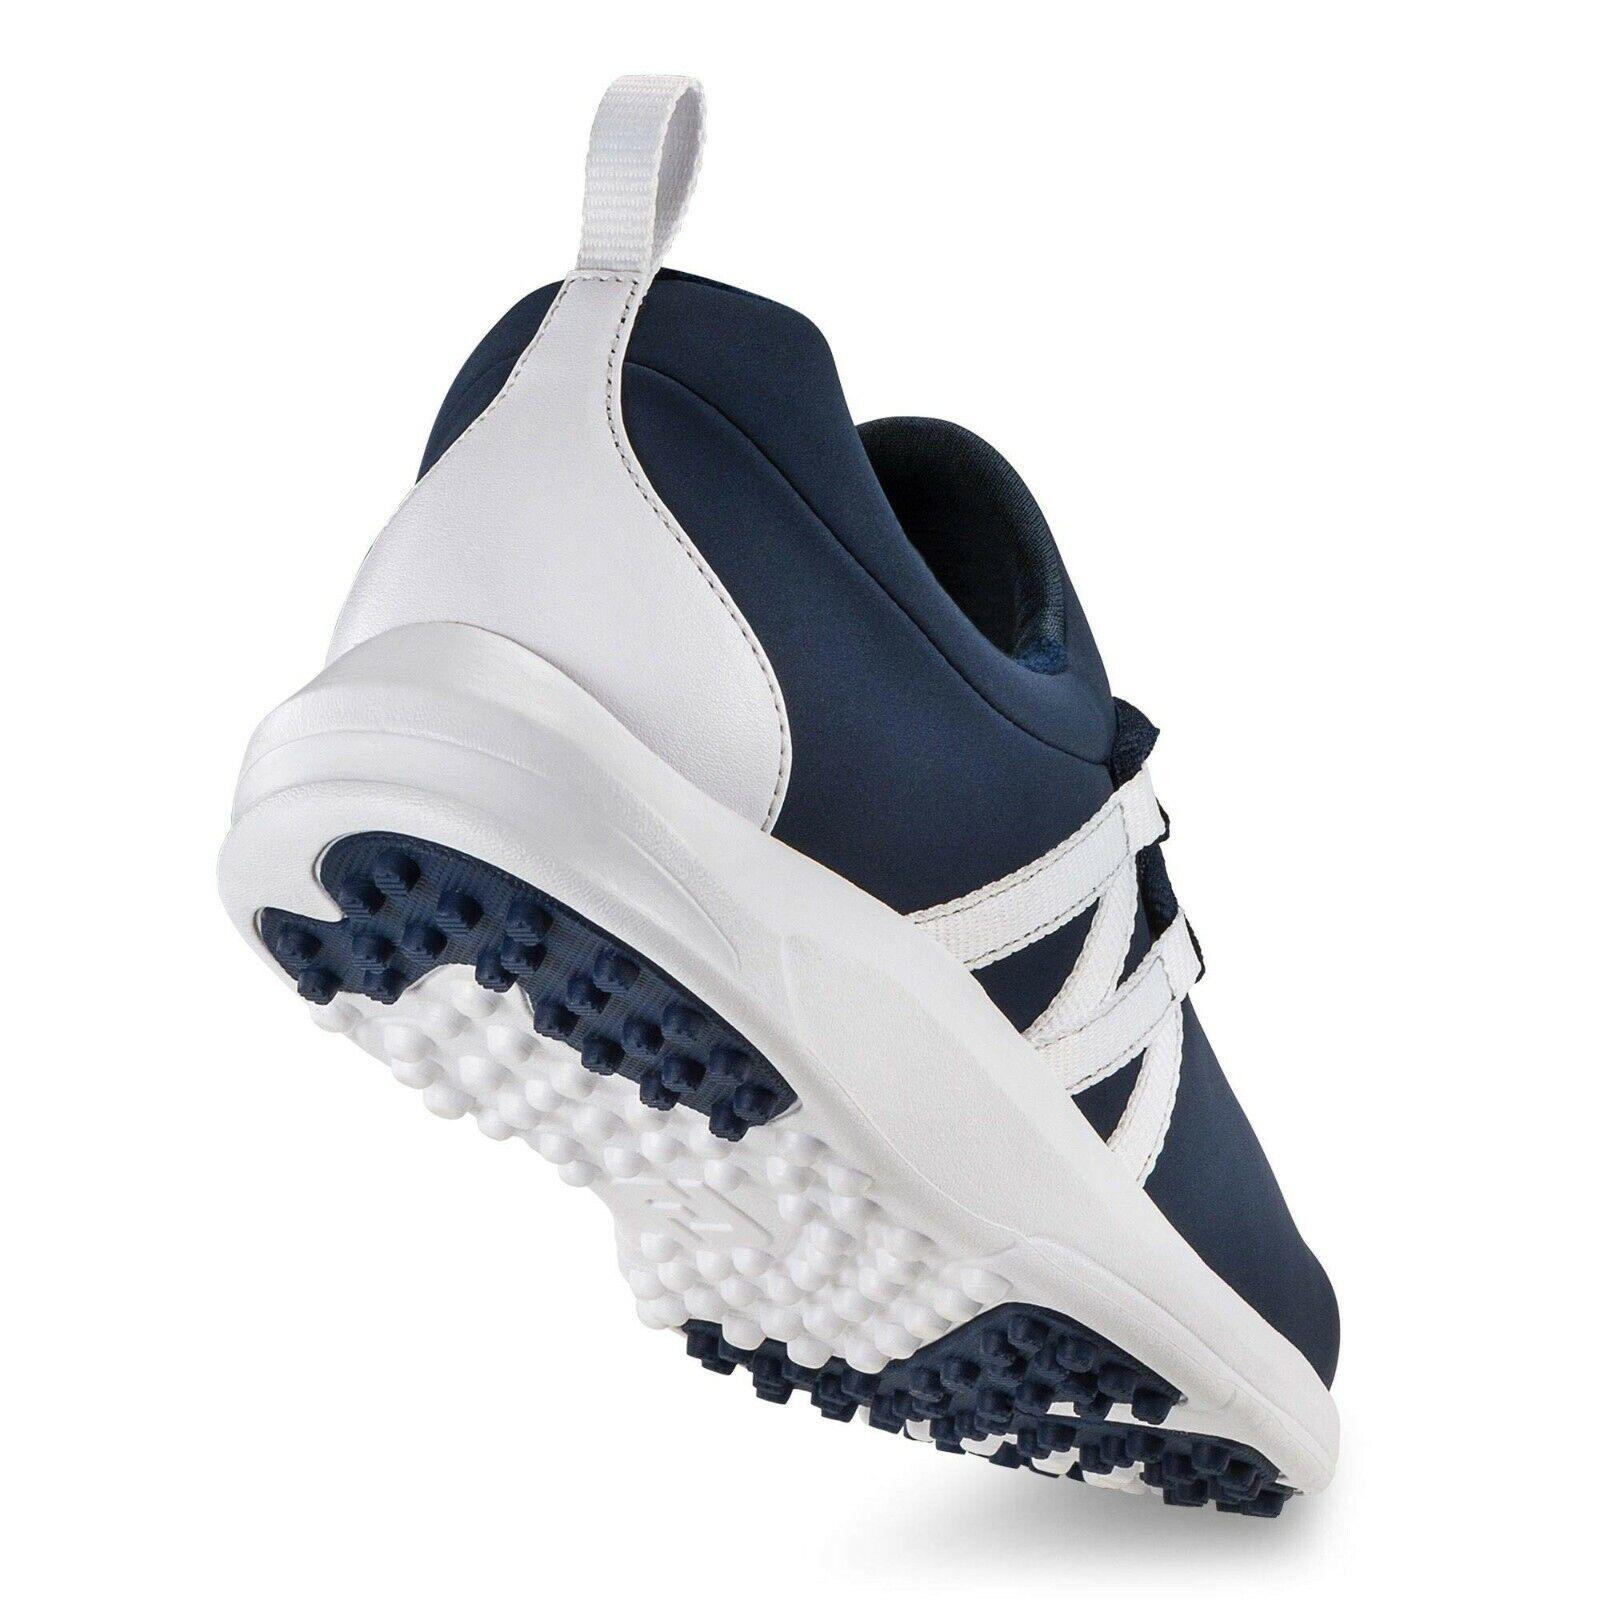 Brand New FootJoy Women's Fj Leisure Slip-on Golf Shoes - Choose Size 4